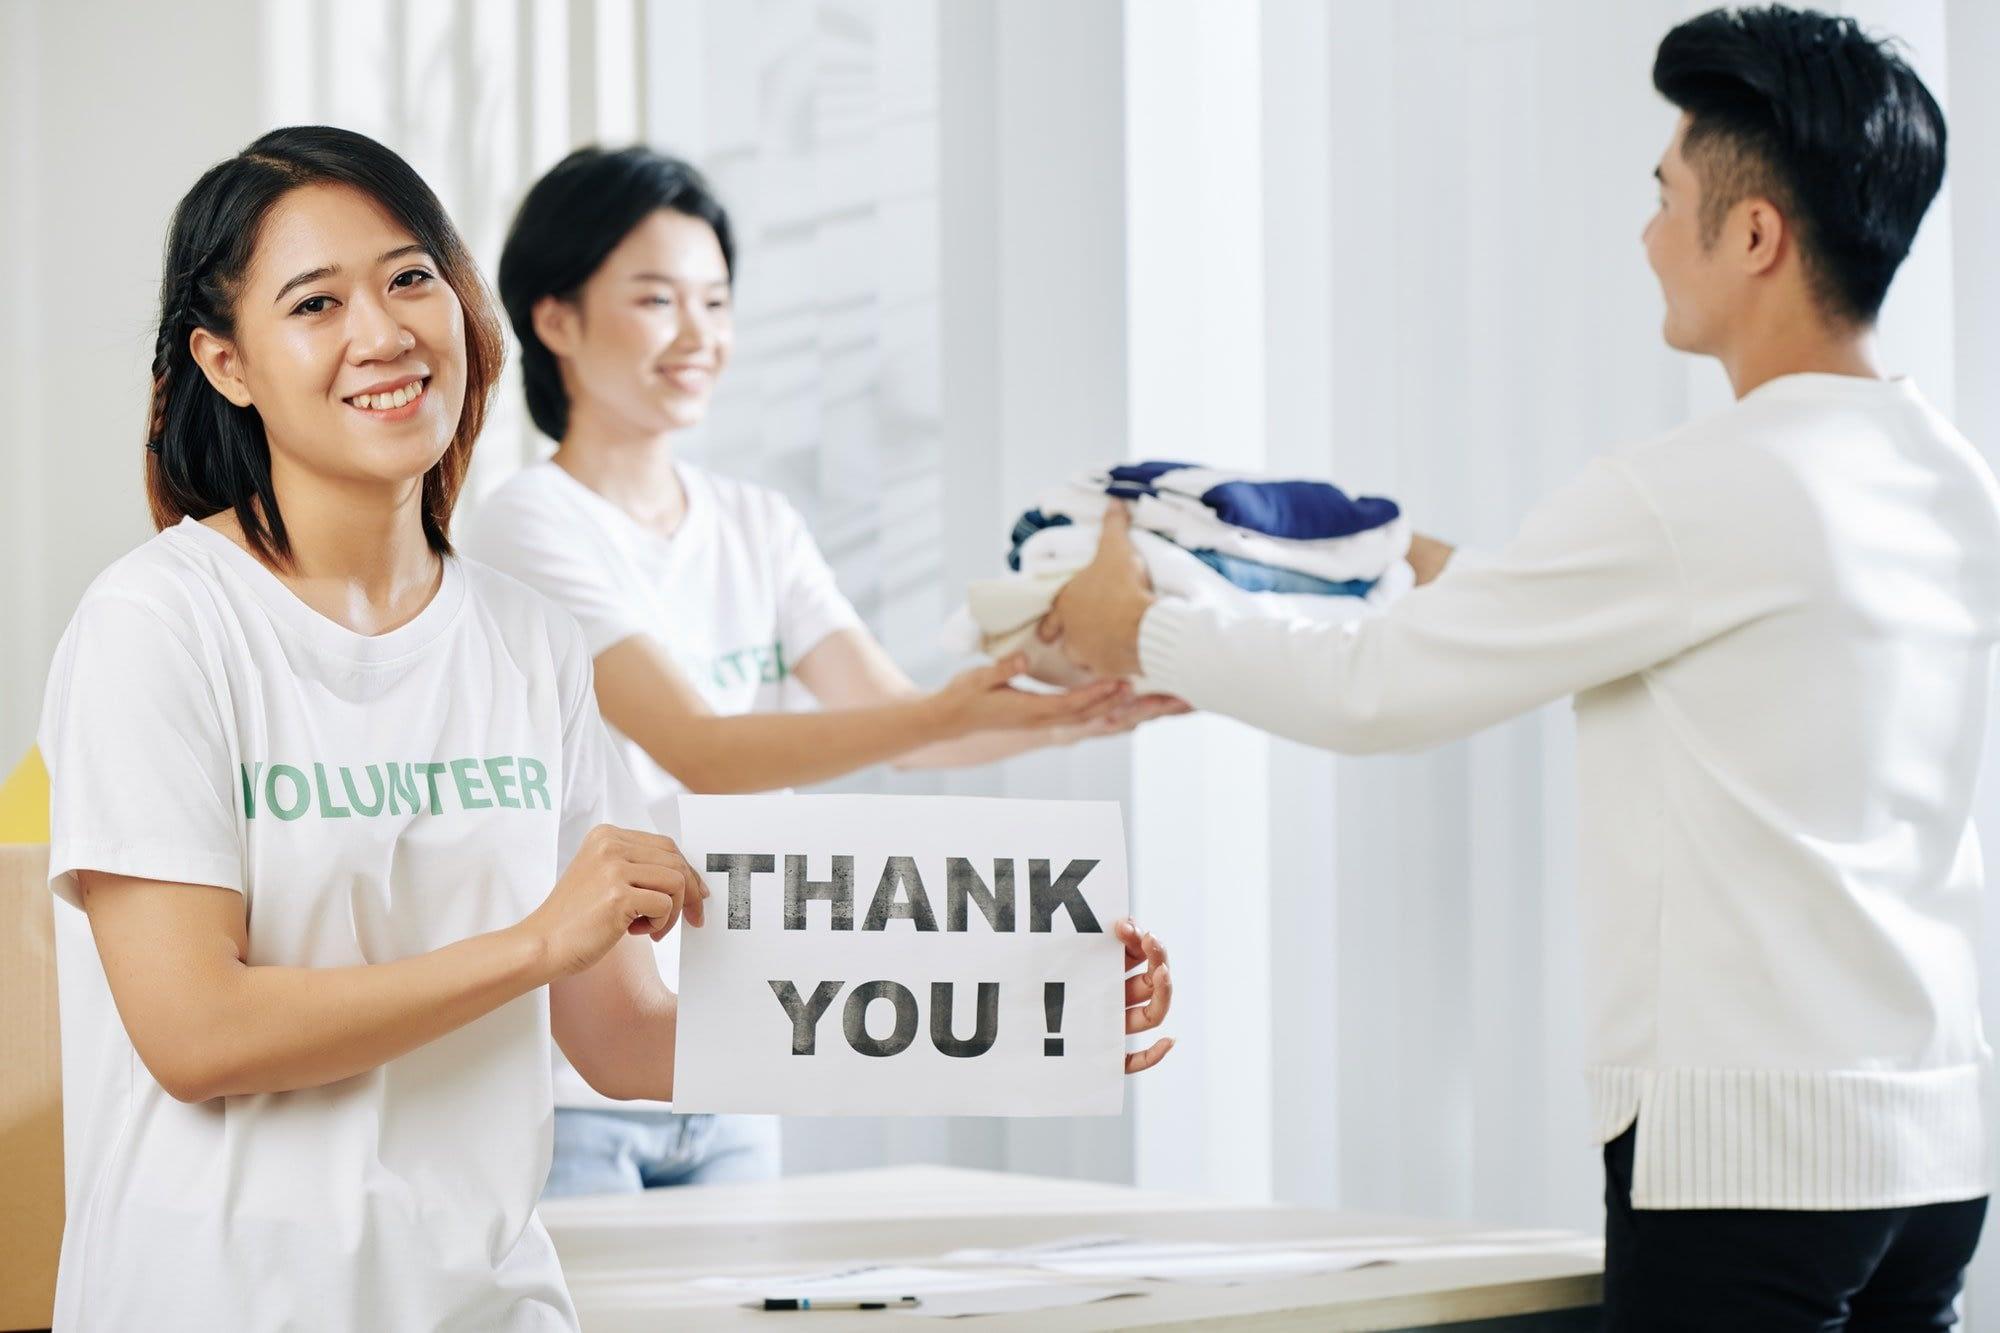 Volunteer working at donation center